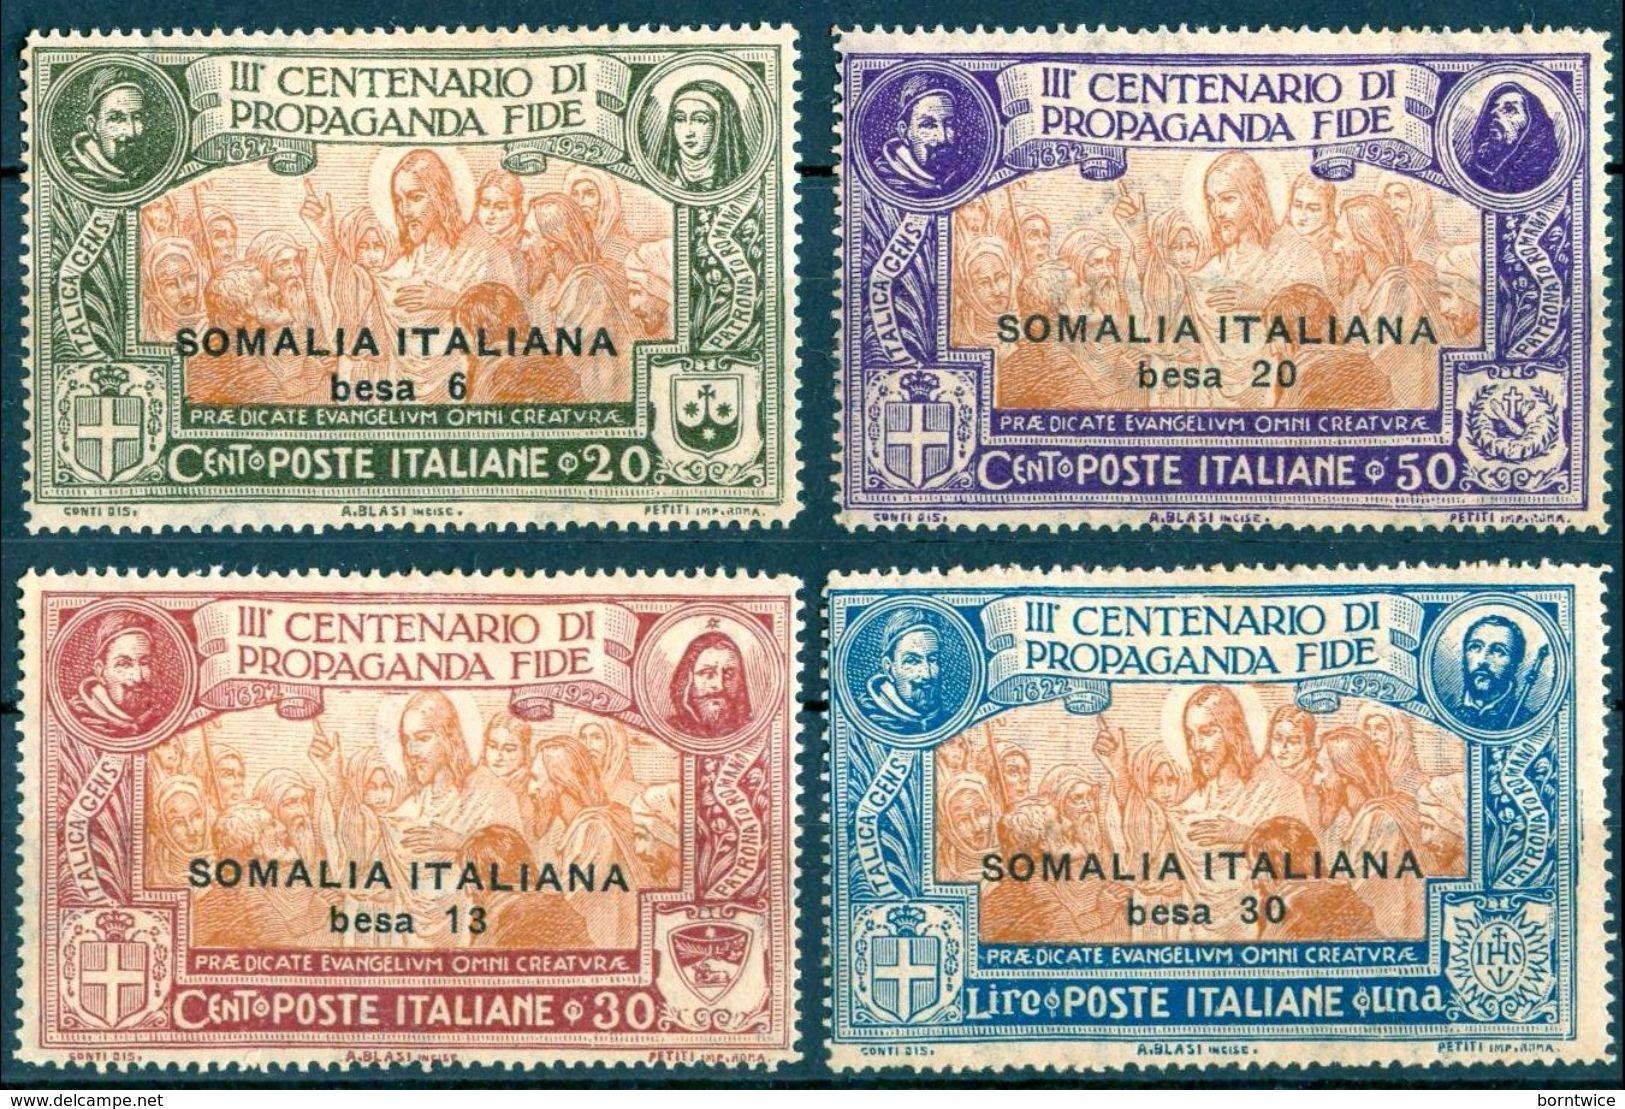 D19 - SOMALIA 1923  Propaganda Of Faith Stamps Of Italy Surch Set (4v), VF MLH, MiNr 47-50, SG 44-7, Sas 45-8 - Eritrea